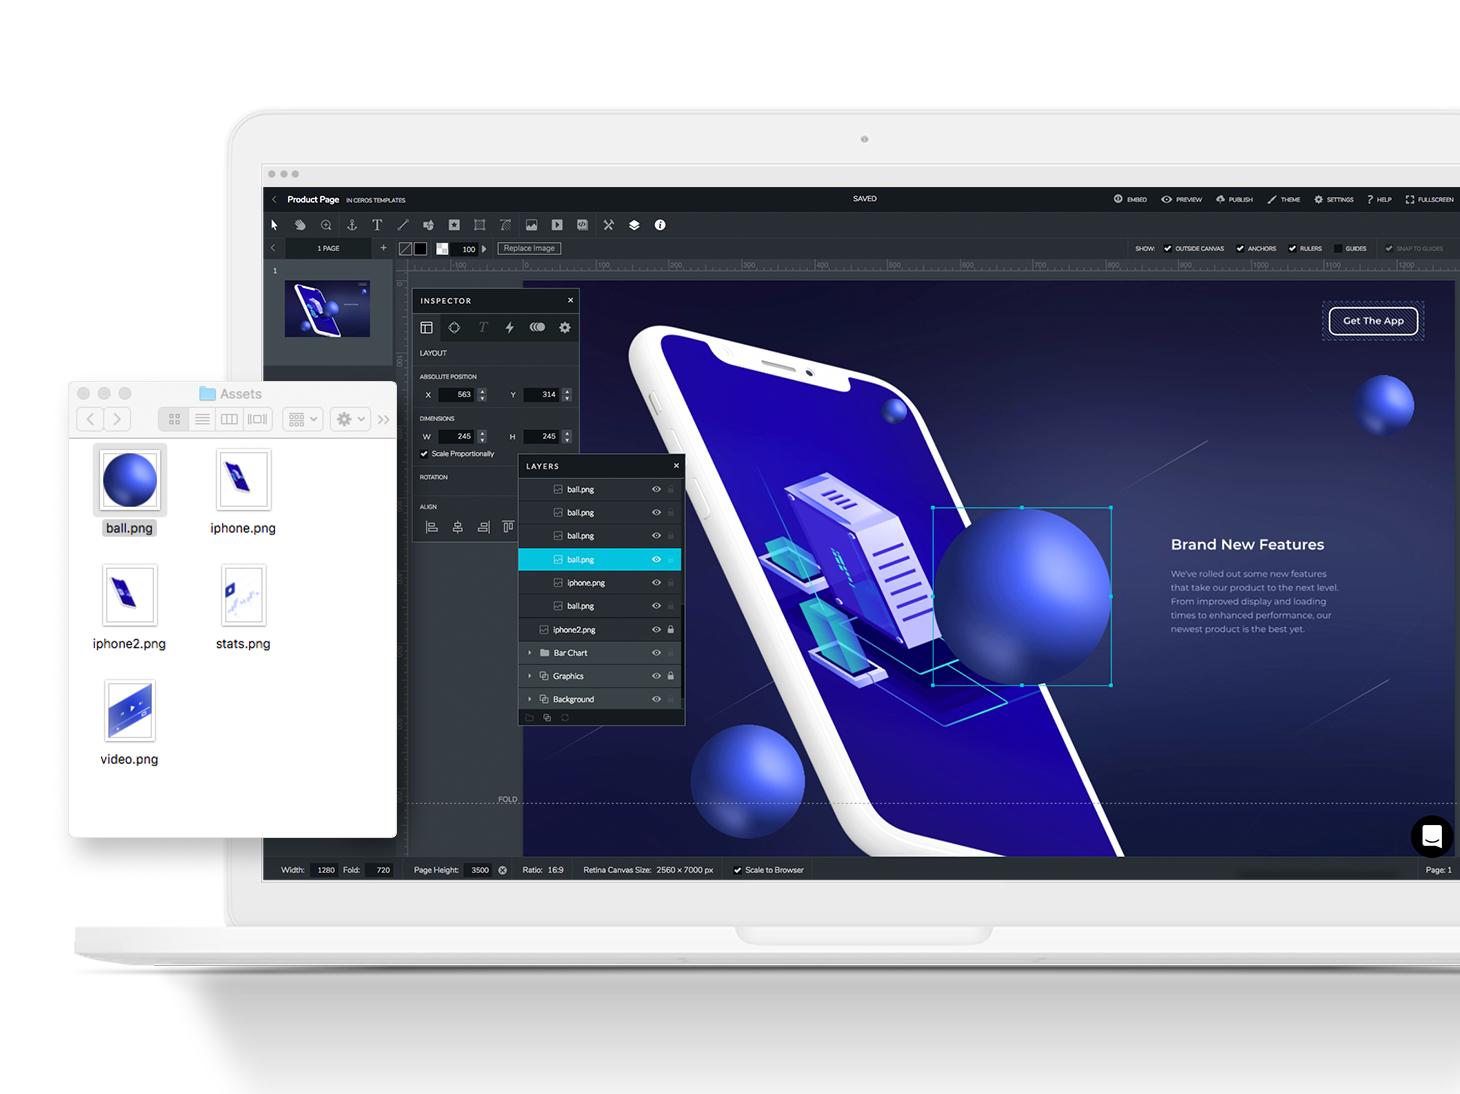 Ceros screenshot: Drag and drop assets from your desktop into the Ceros studio.